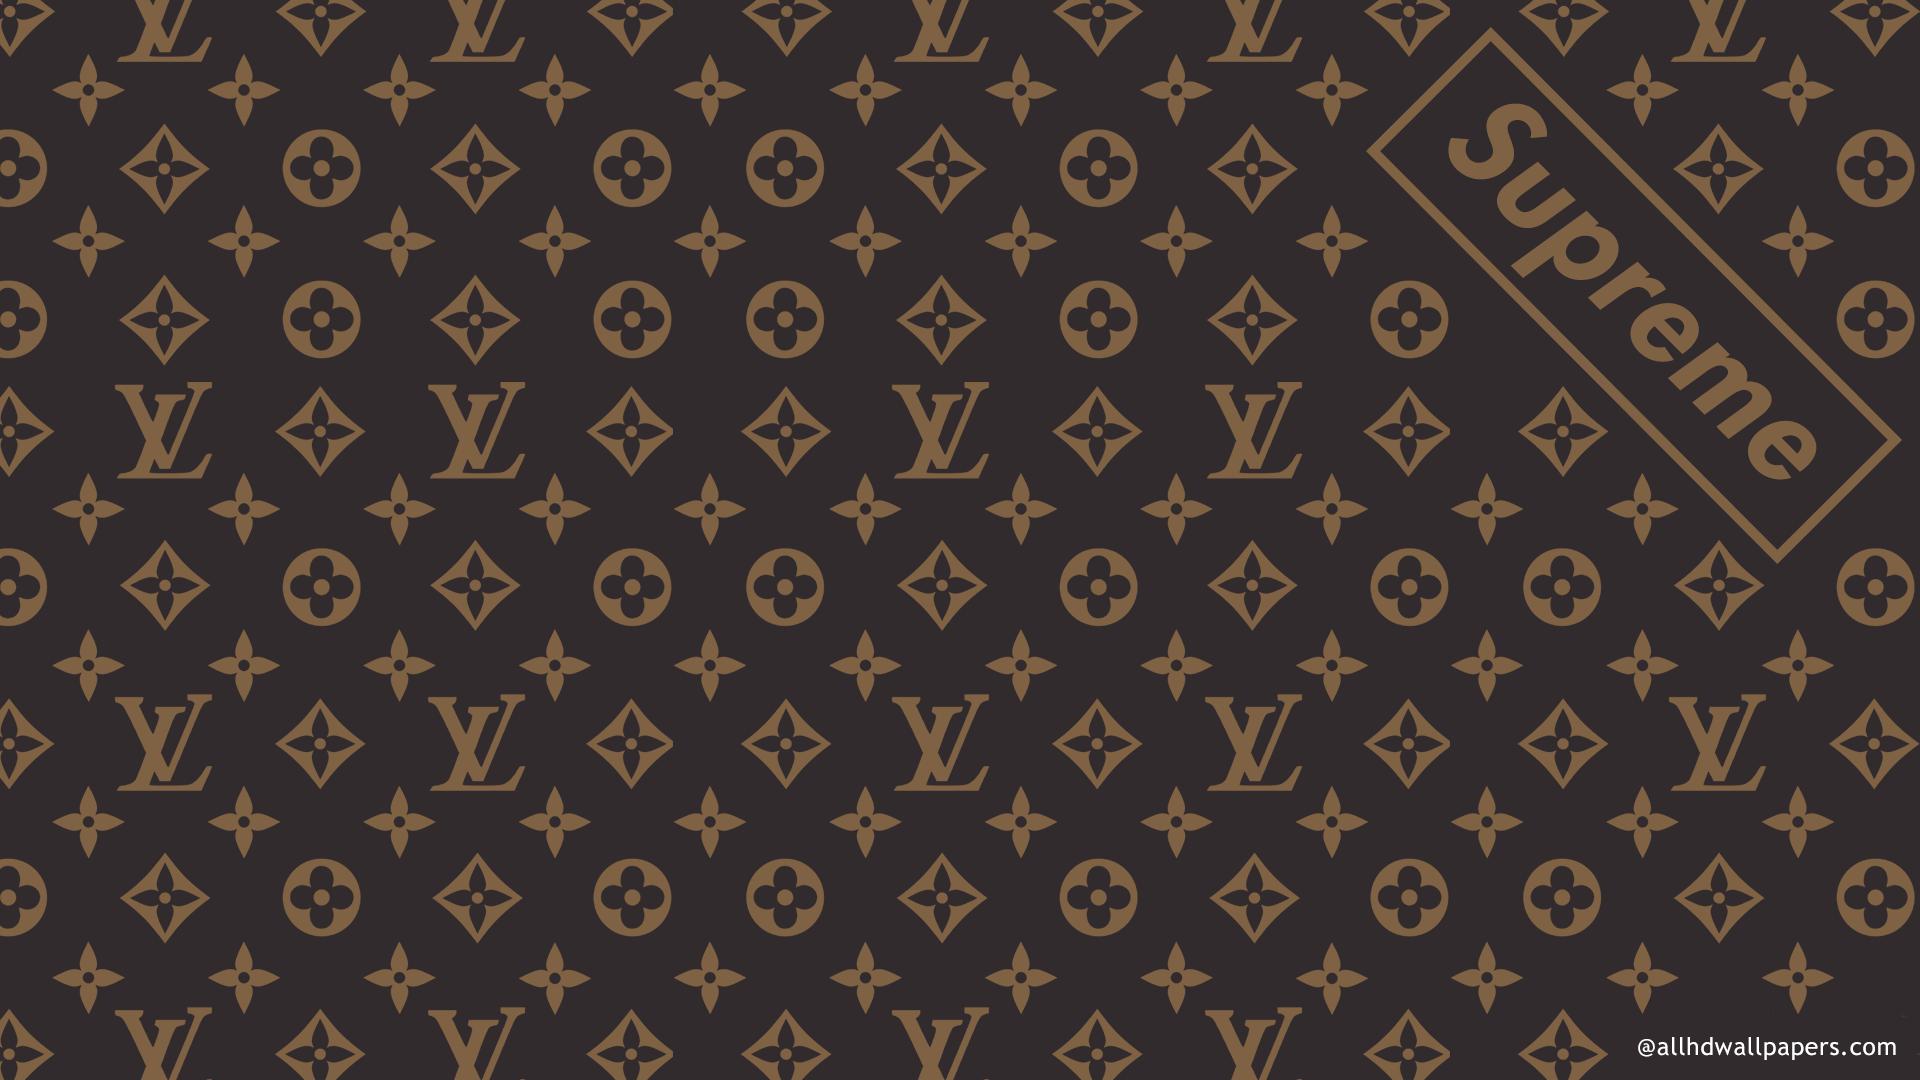 70 Supreme Wallpapers in 4K   AllHDWallpapers 1920x1080